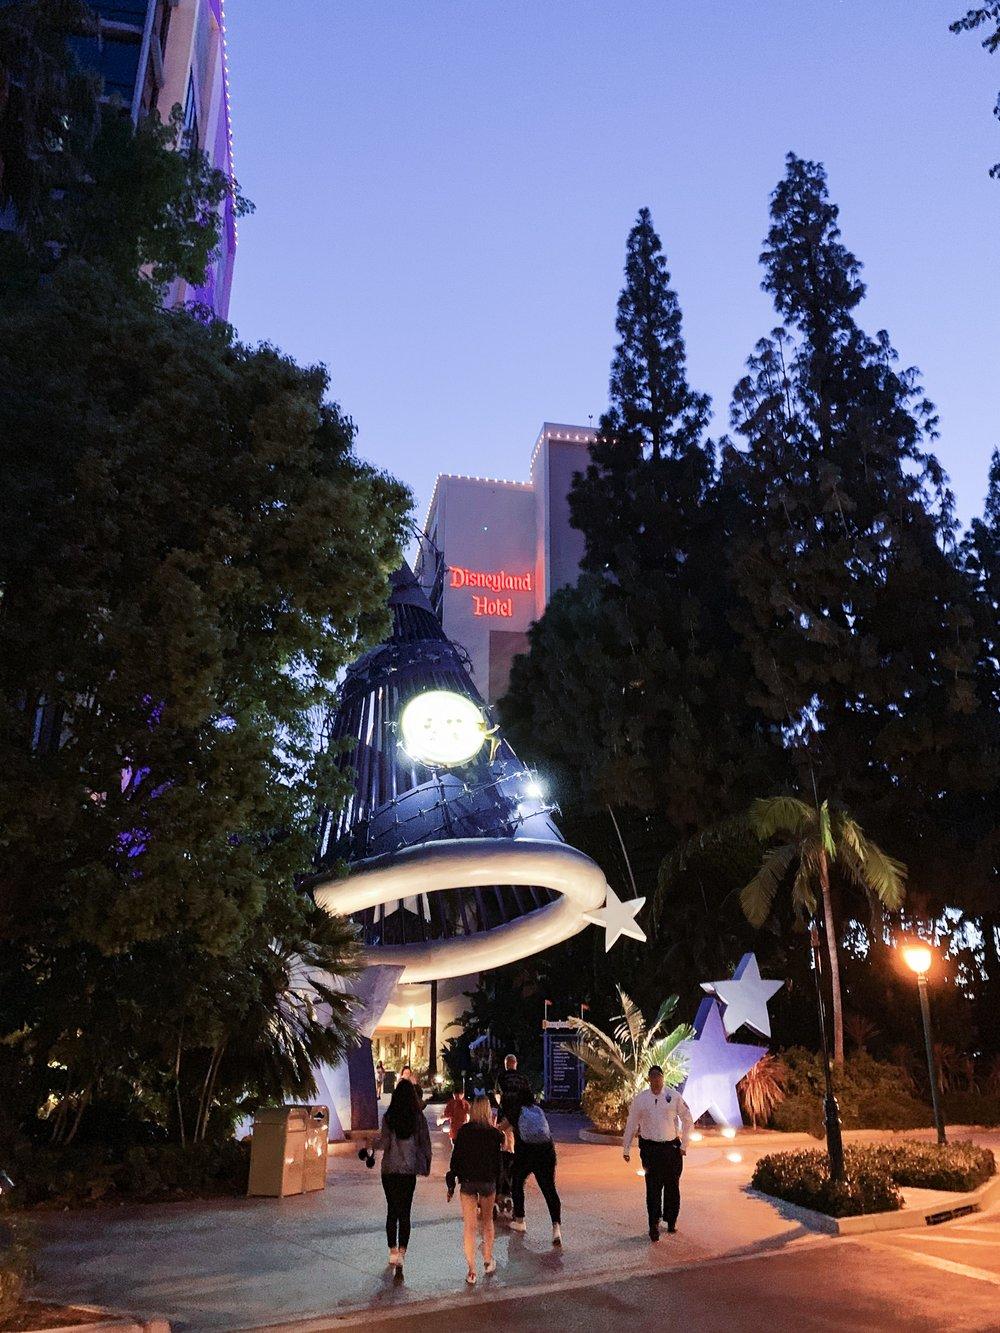 Outside of Disneyland Hotel